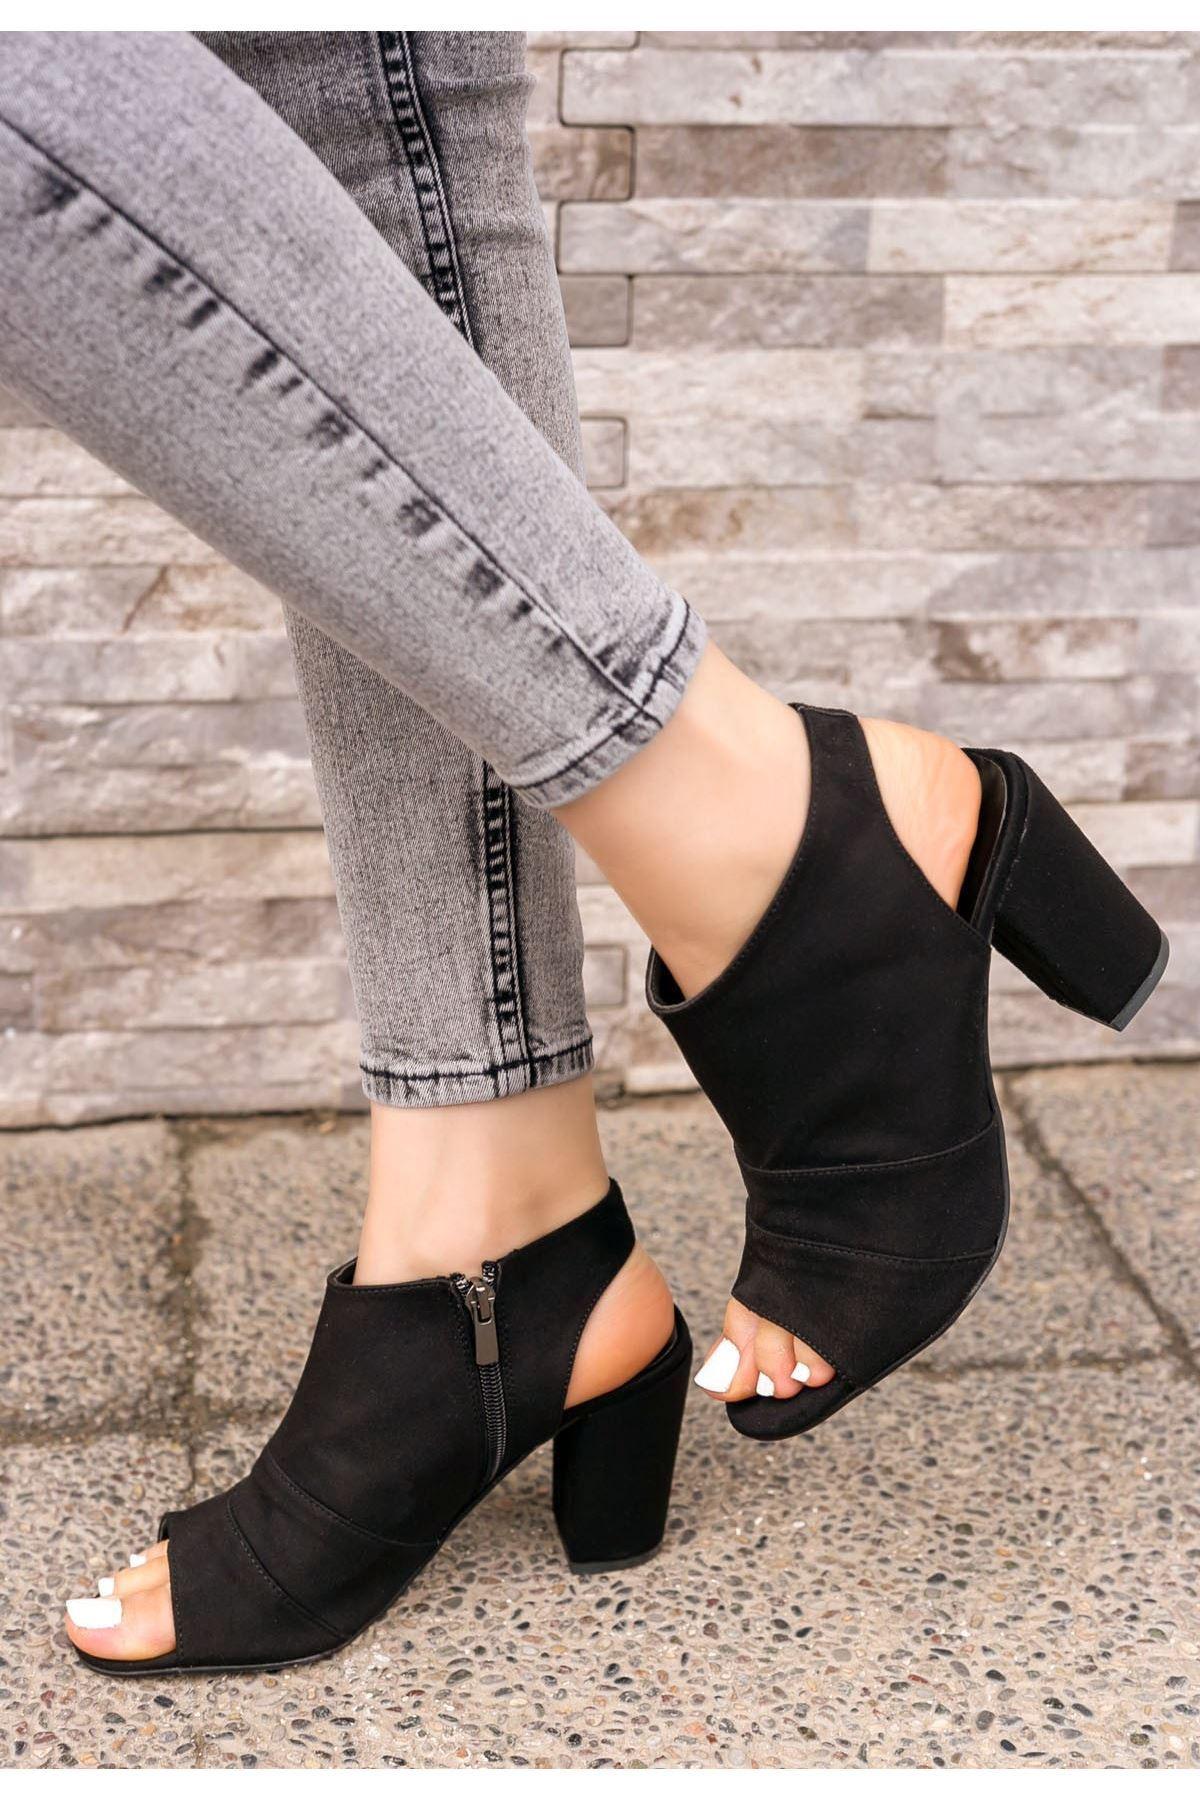 Dolly Siyah Süet Topuklu Ayakkabı